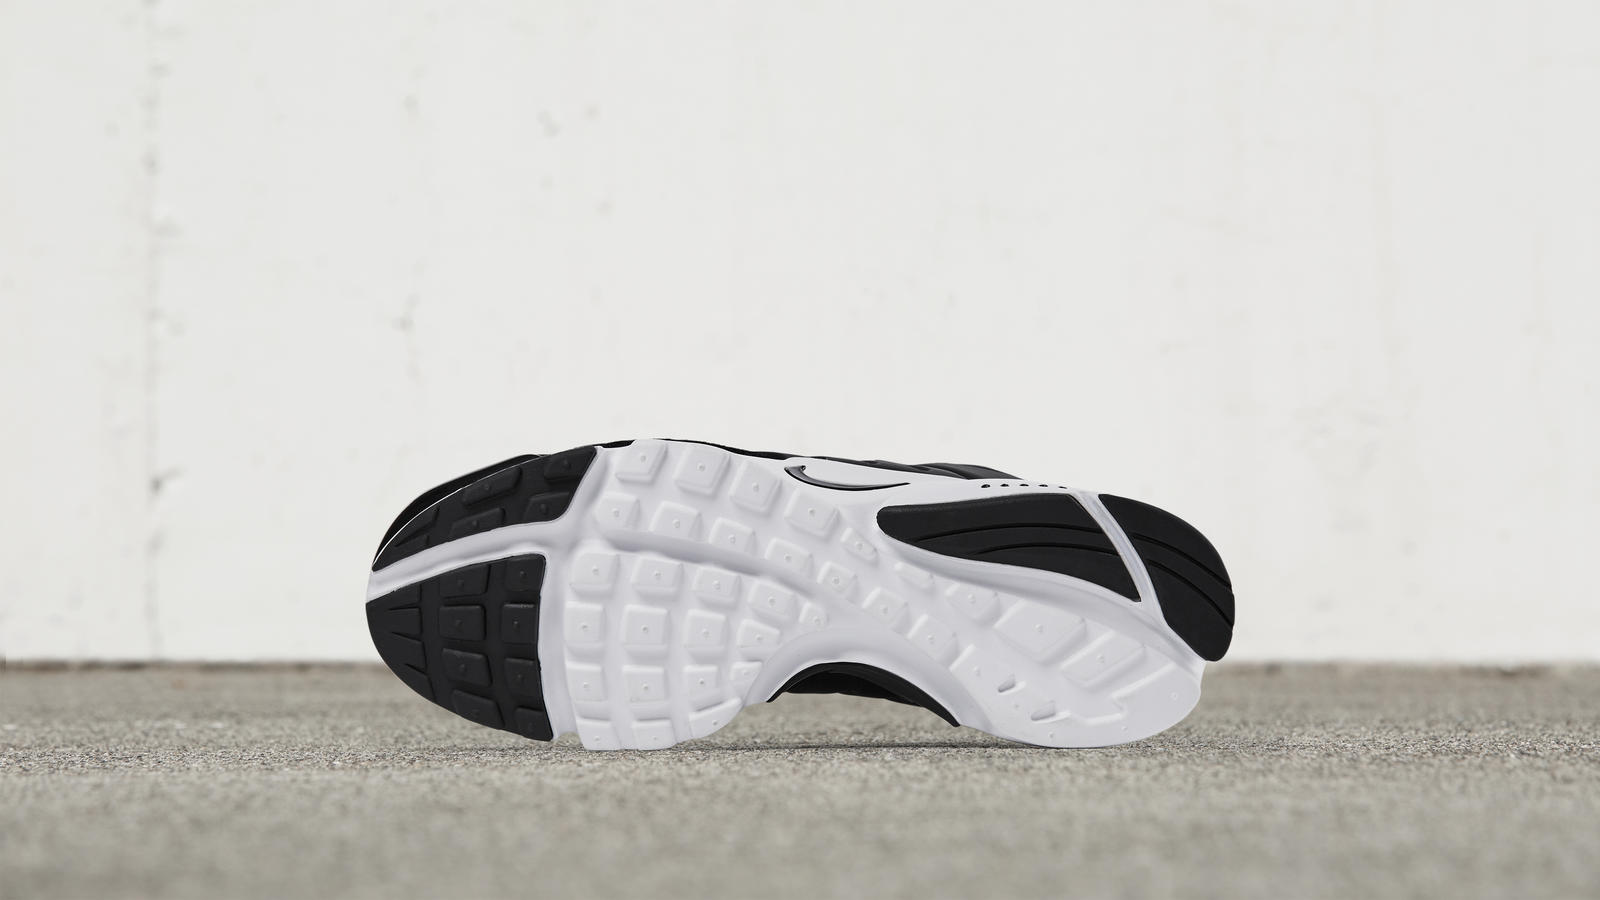 97f7249109c Nike Air Presto Ultra Flyknit - Nike News